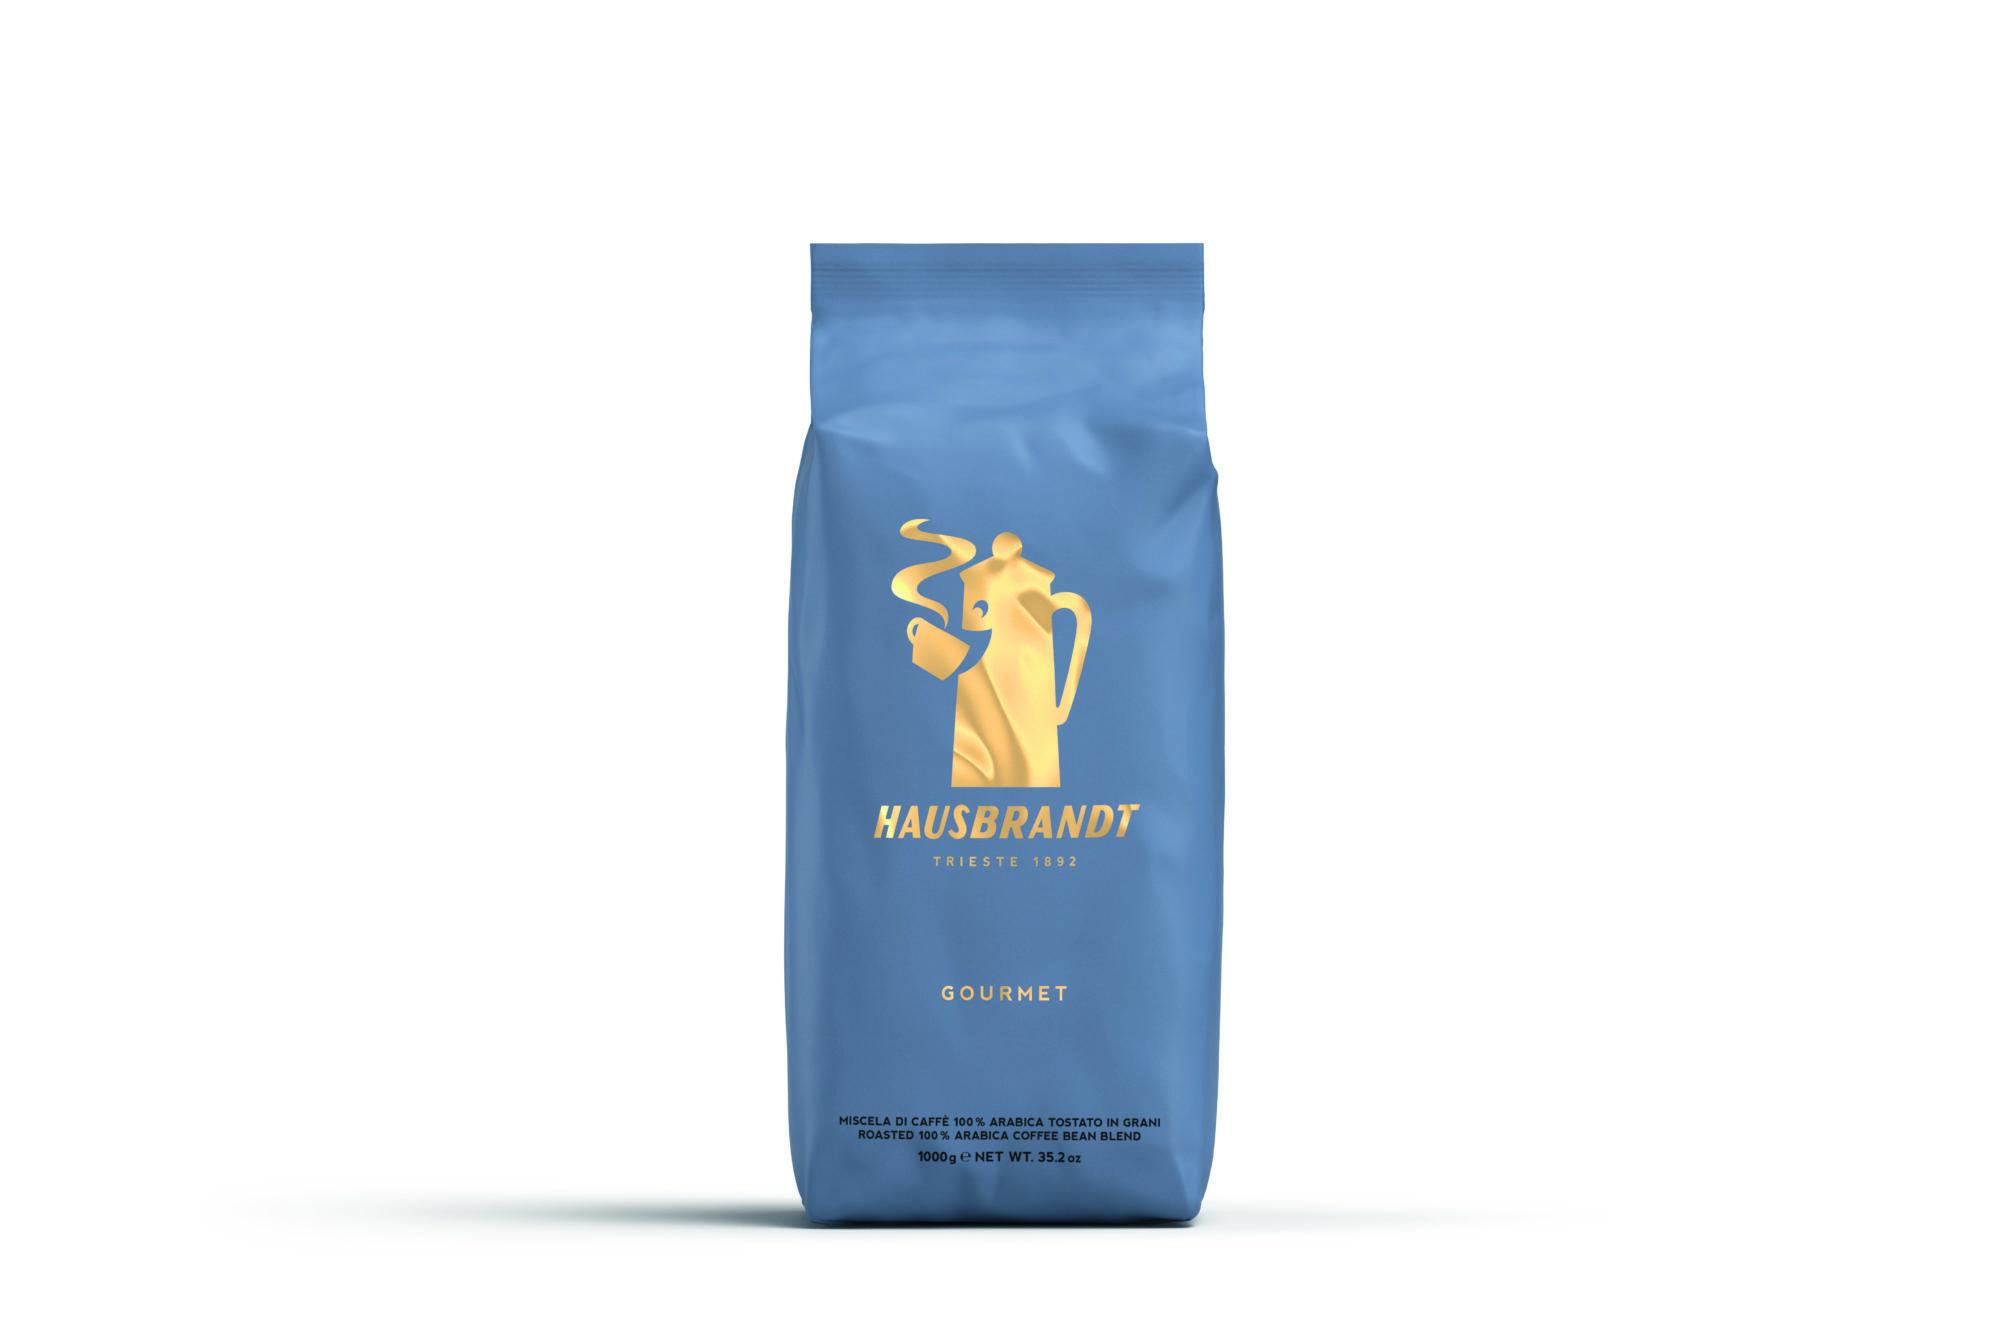 HAUSBRANDT Caffé Gourmet 6 X 1 KG Bohnen im Beutel